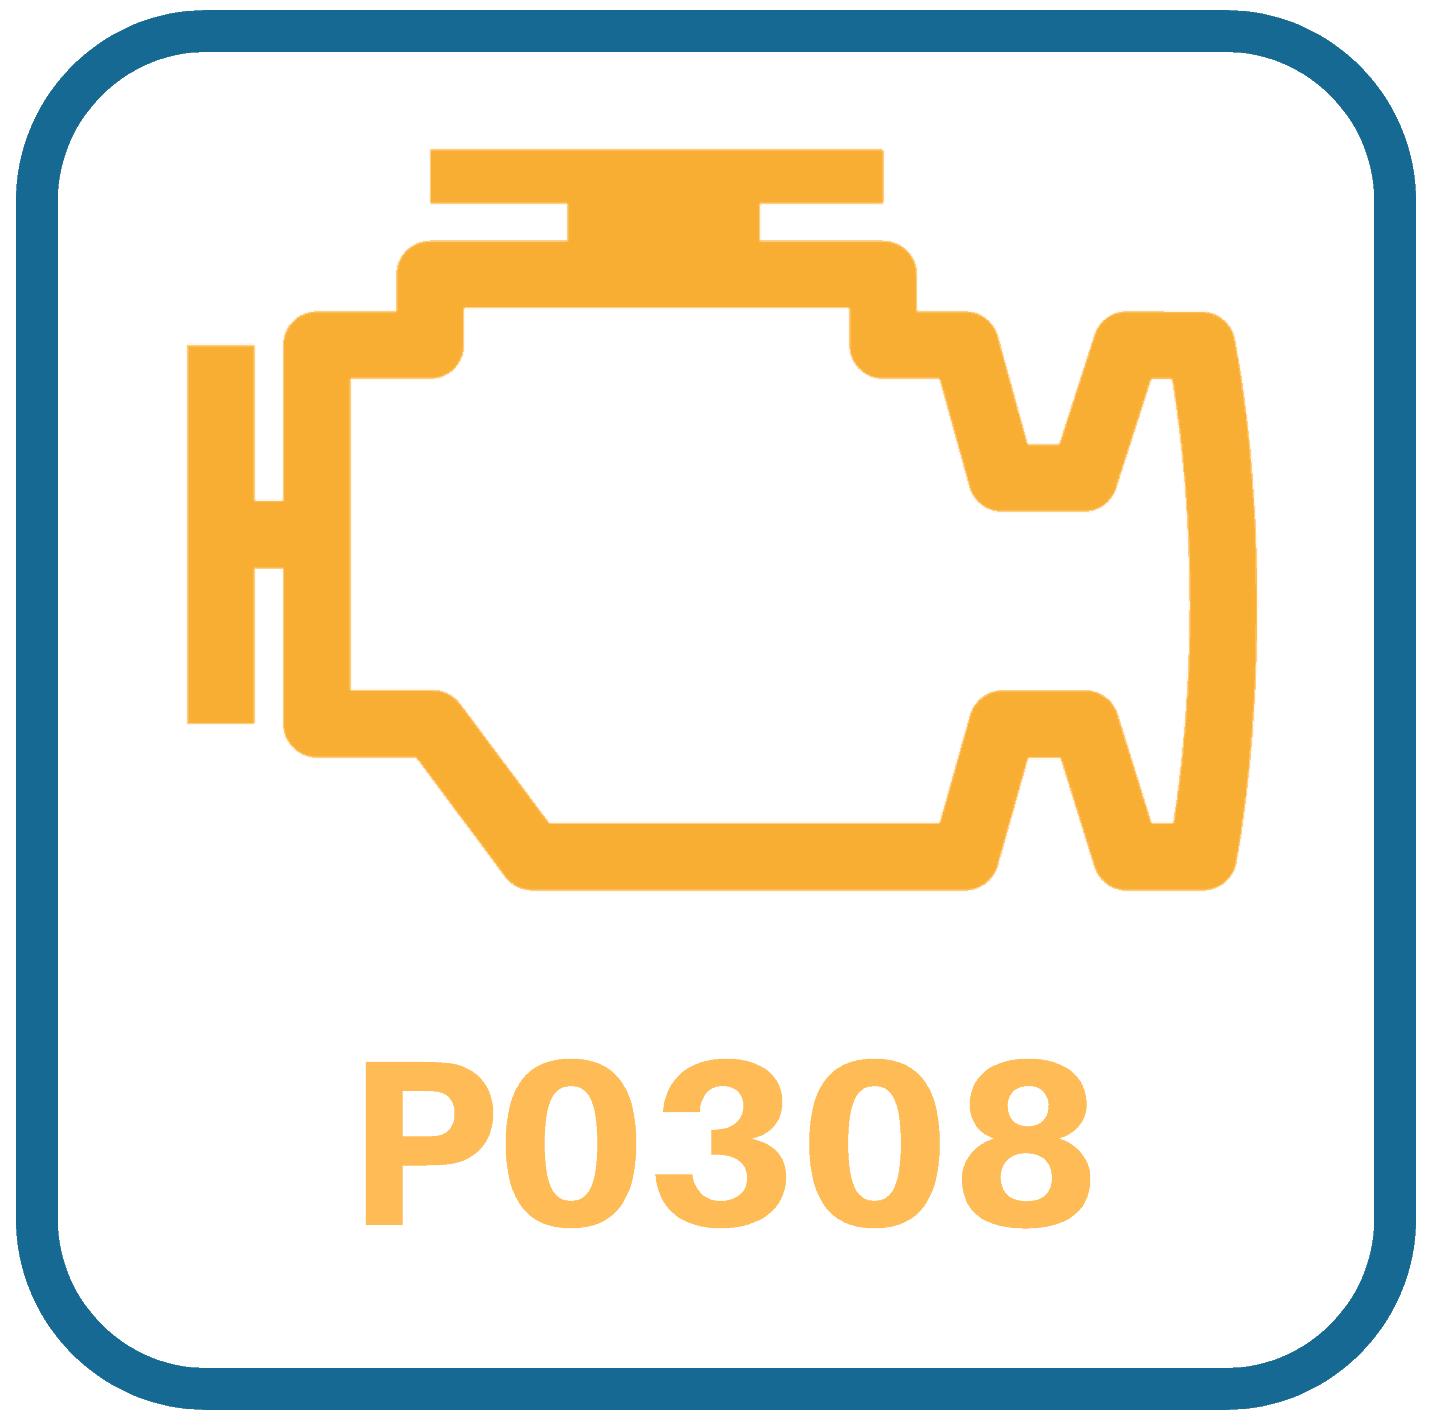 Chevy Equinox P0308 OBD2 Code